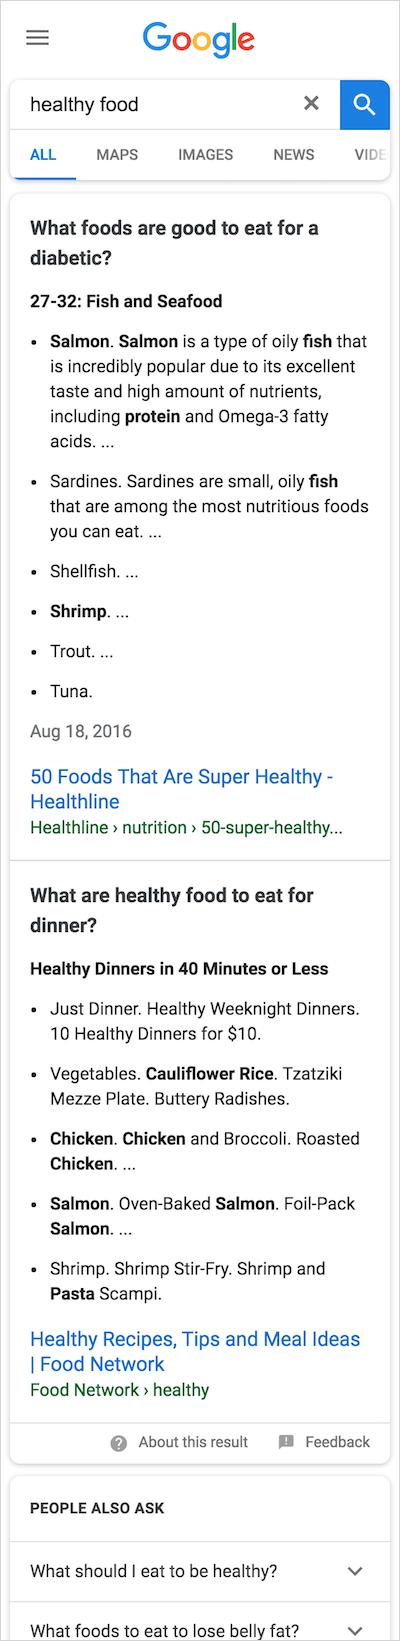 「healthy food」のマルチファセット強調スニペット